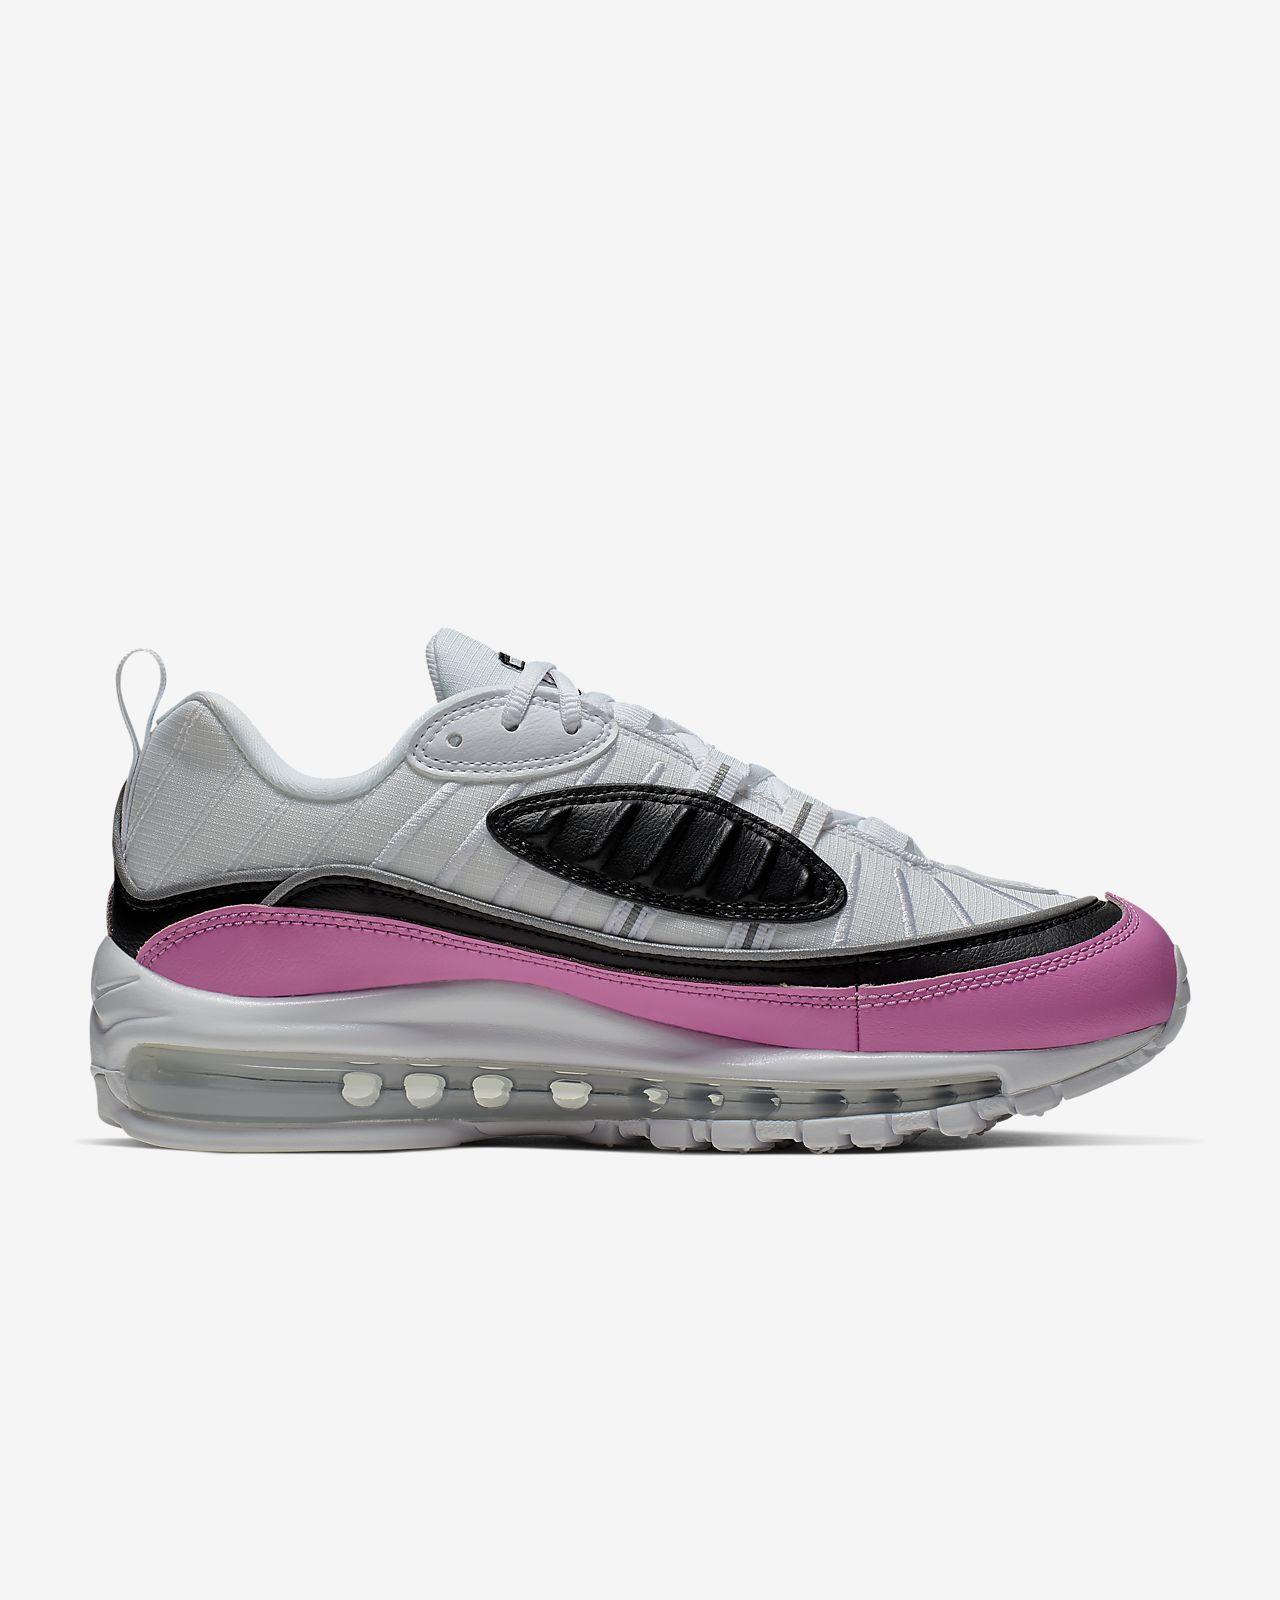 dadfd554 Nike Air Max 98 SE Women's Shoe. Nike.com